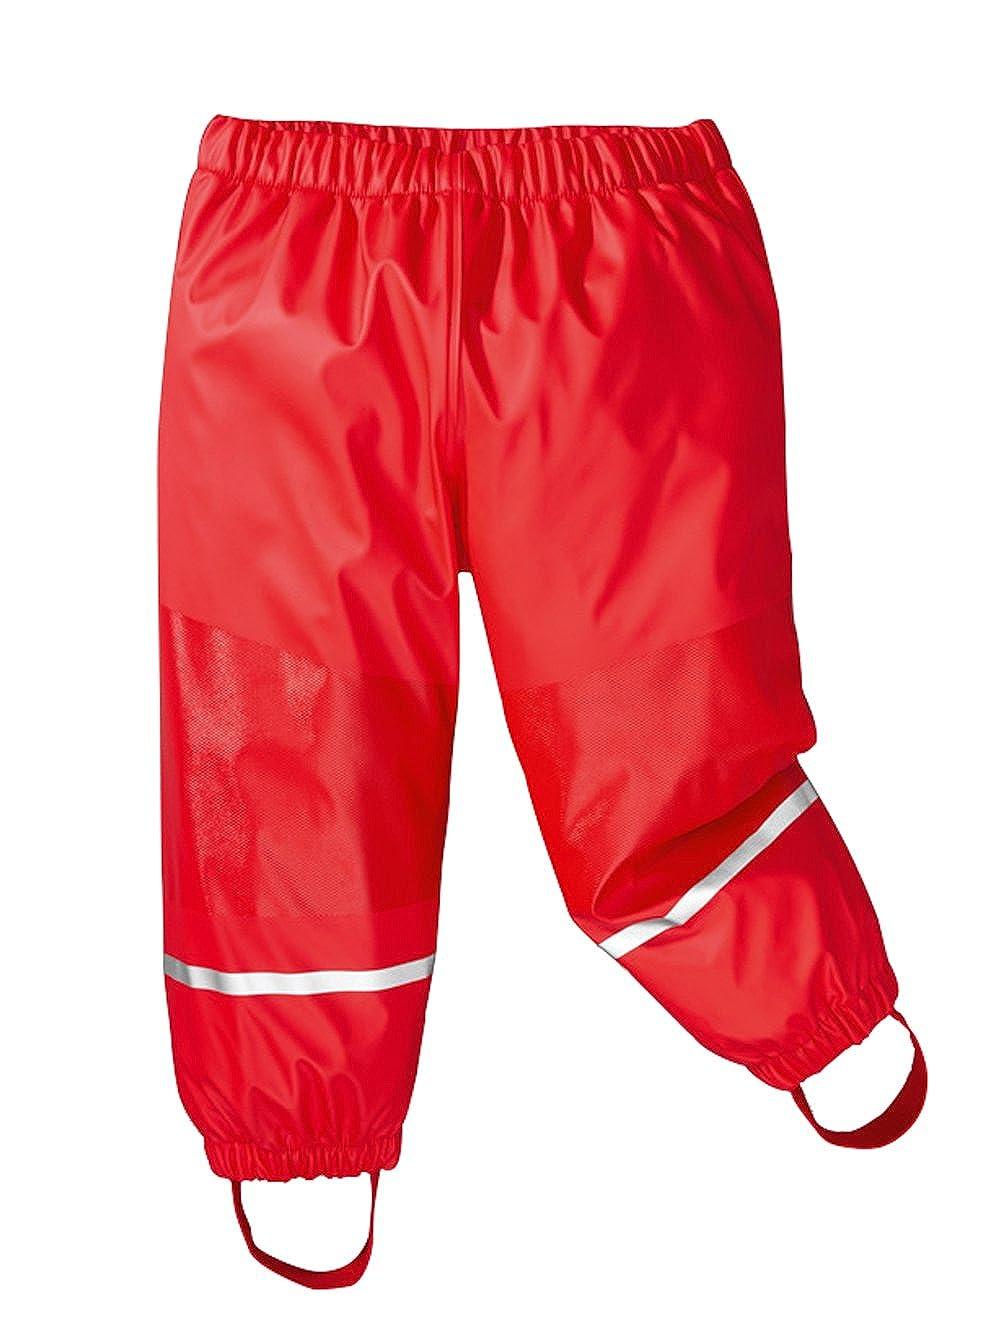 LLXX Boy's Waterproof Trousers Kids Windproof Pants and Rain Trousers